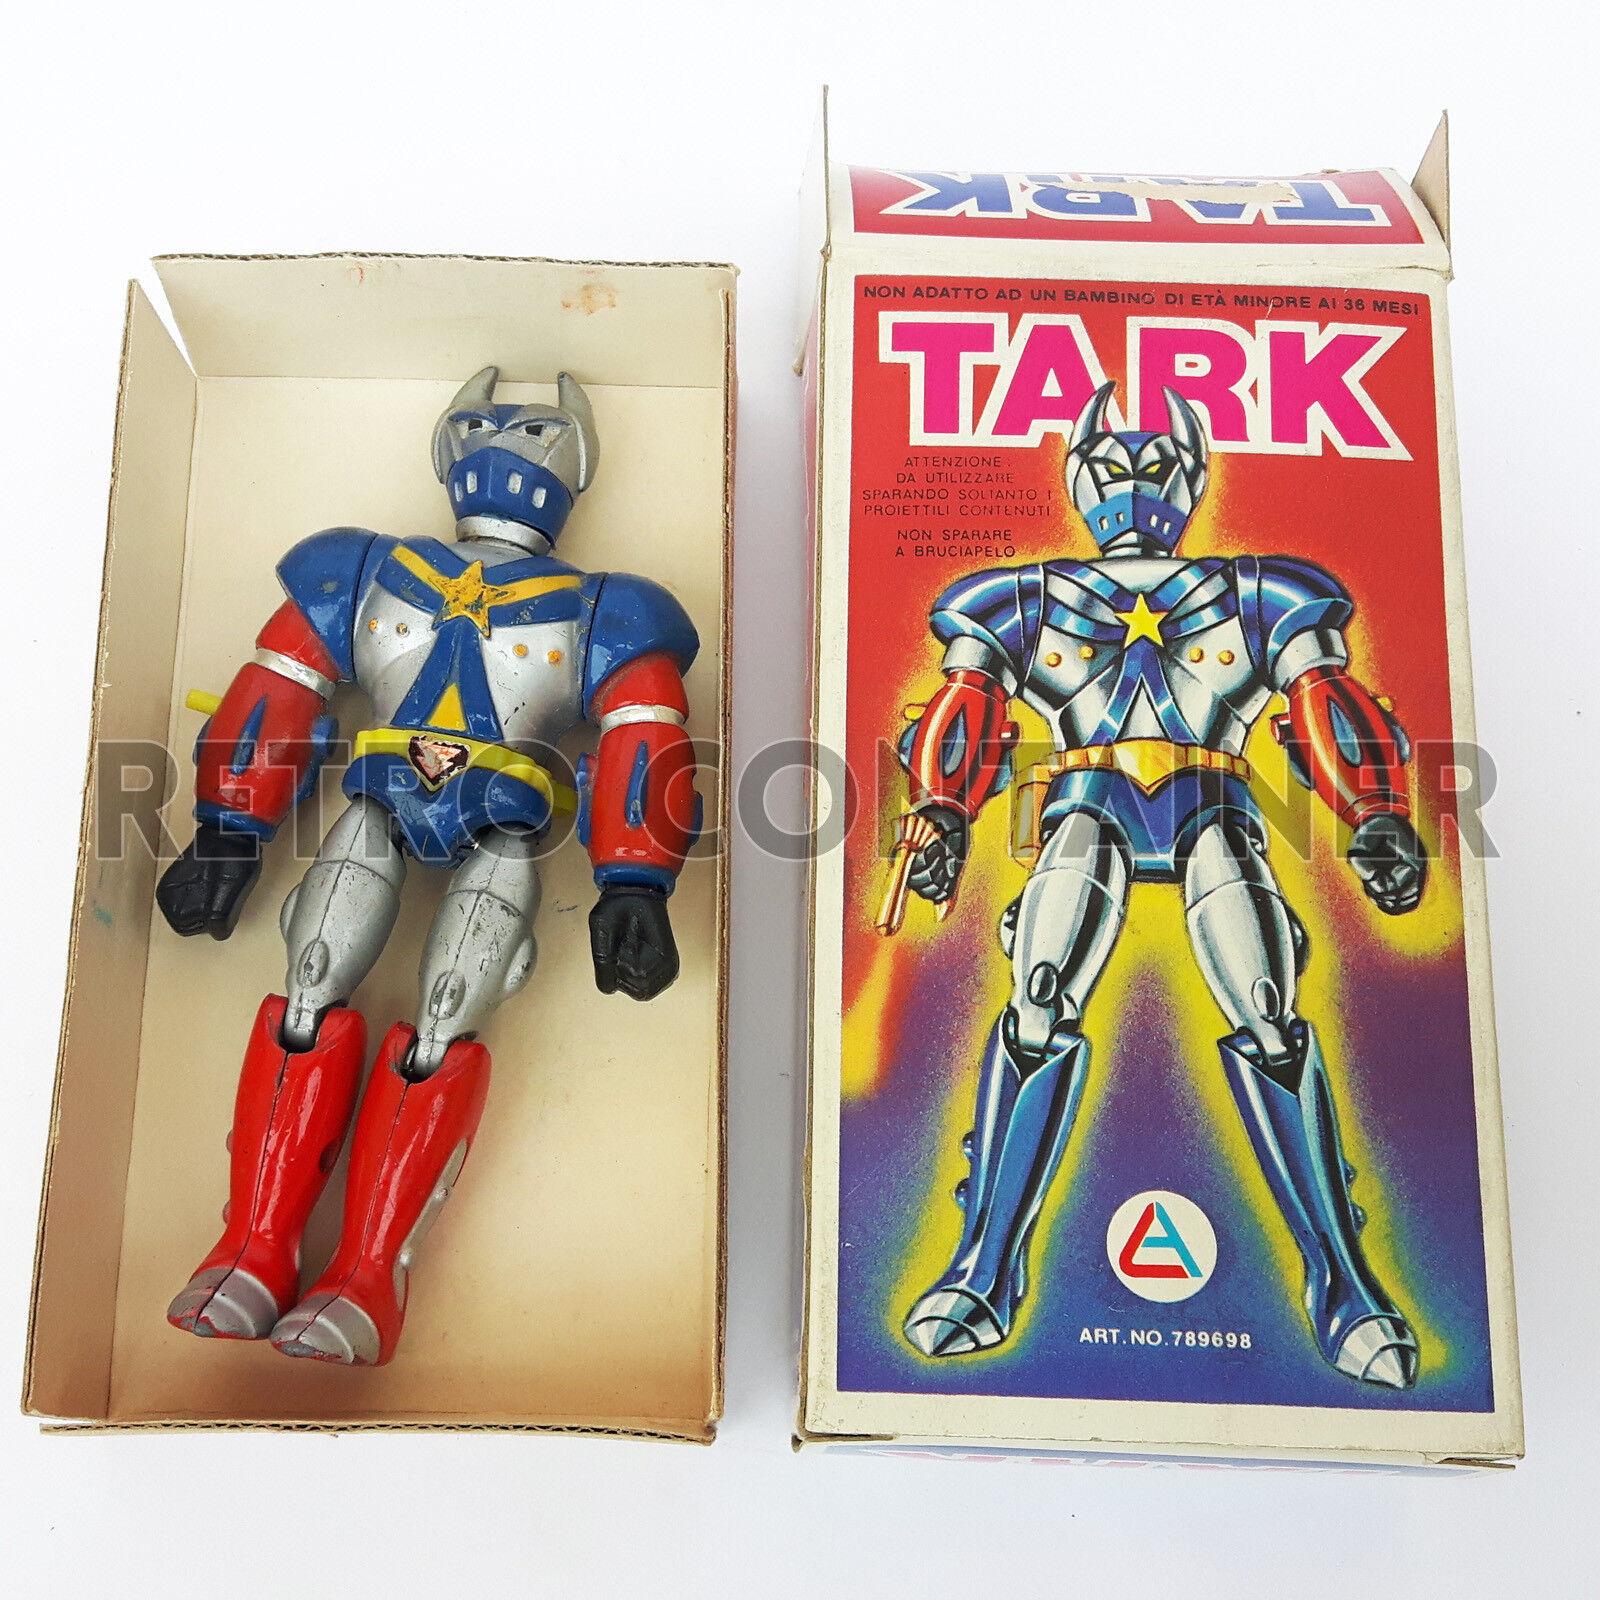 Vintage Toys - Robot Zork Tekkaman KO Al-Es Die-Cast With Box 1980's Hong Kong